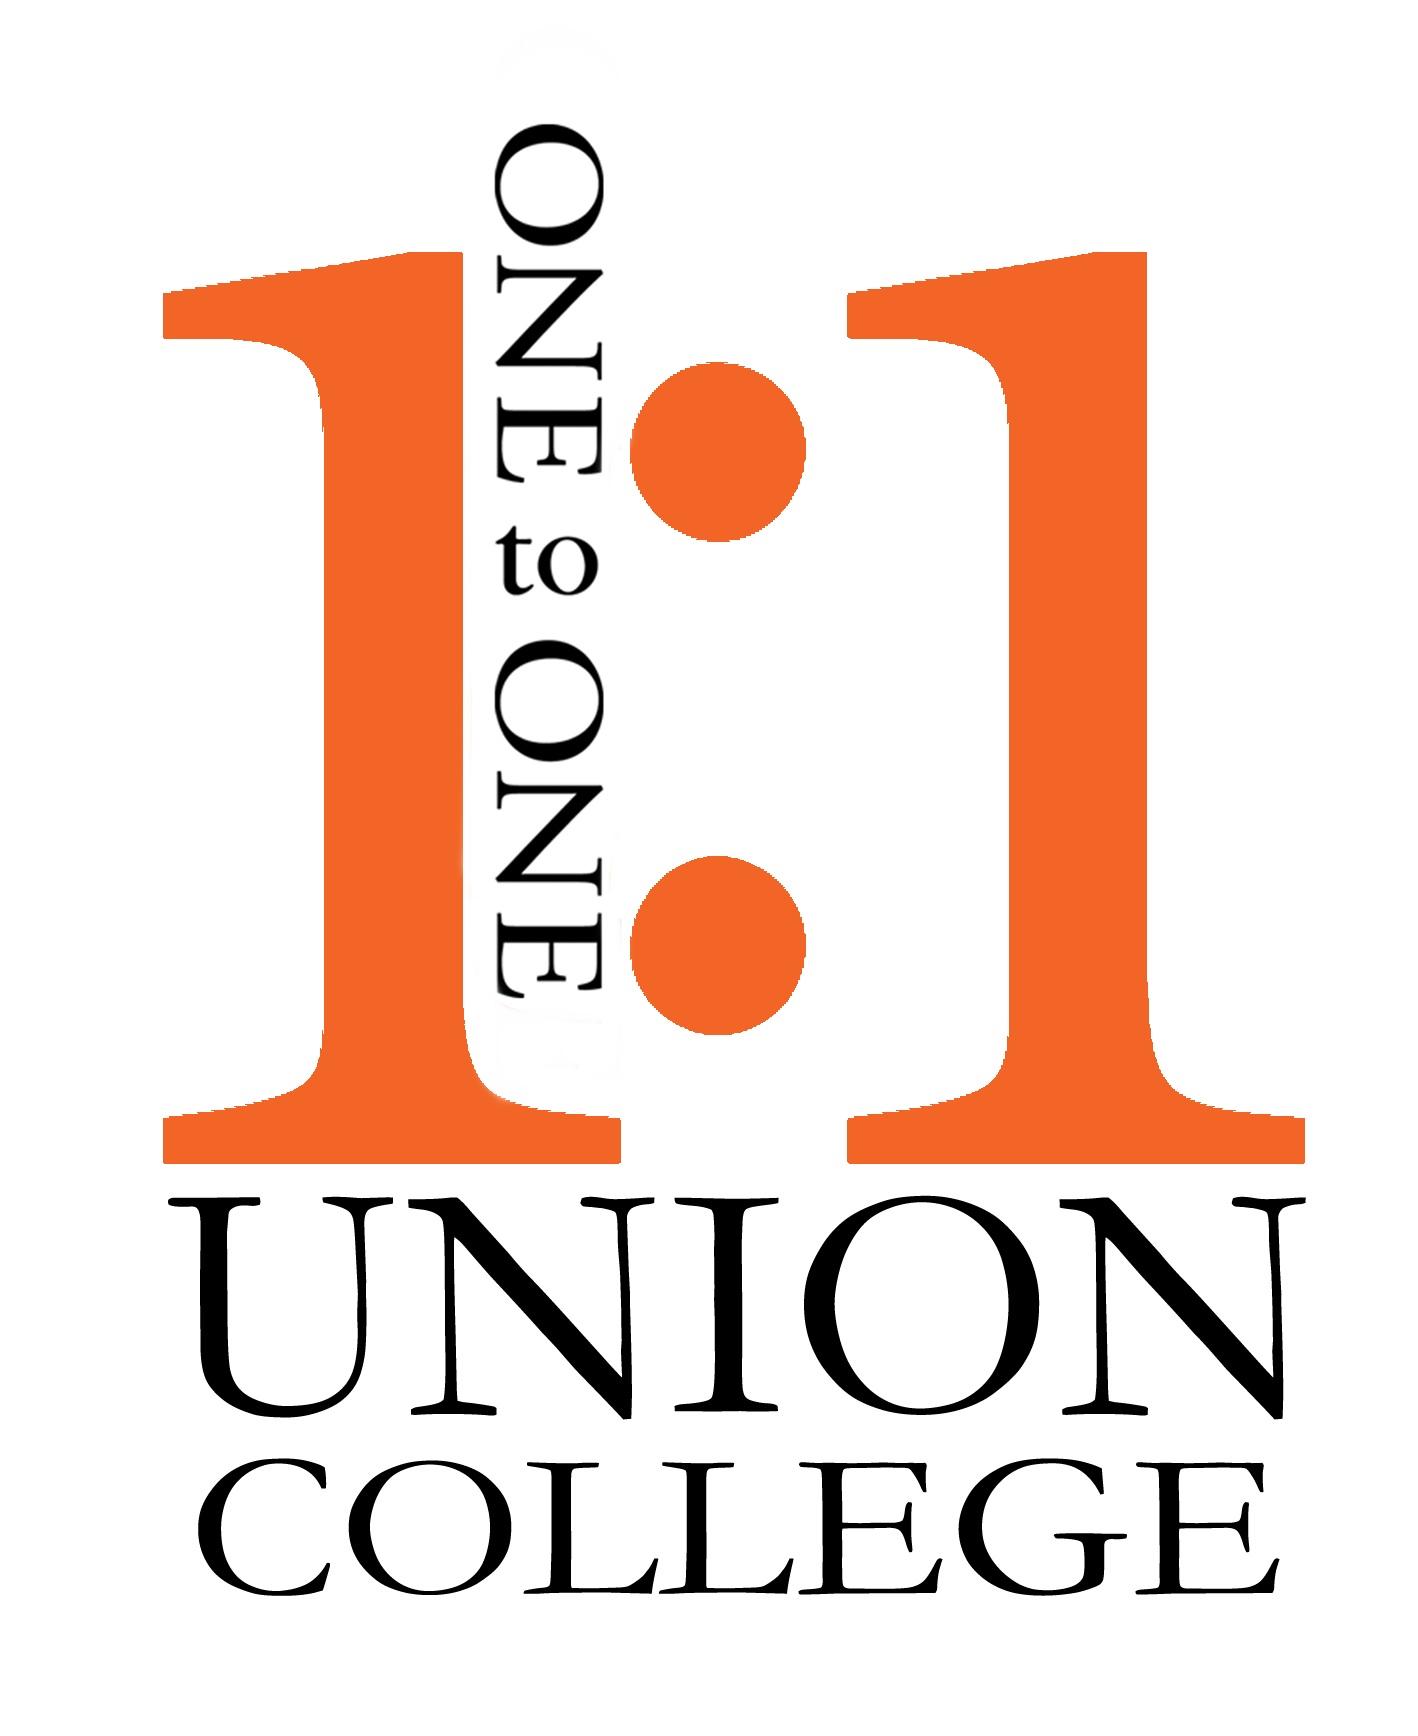 Union College Logos